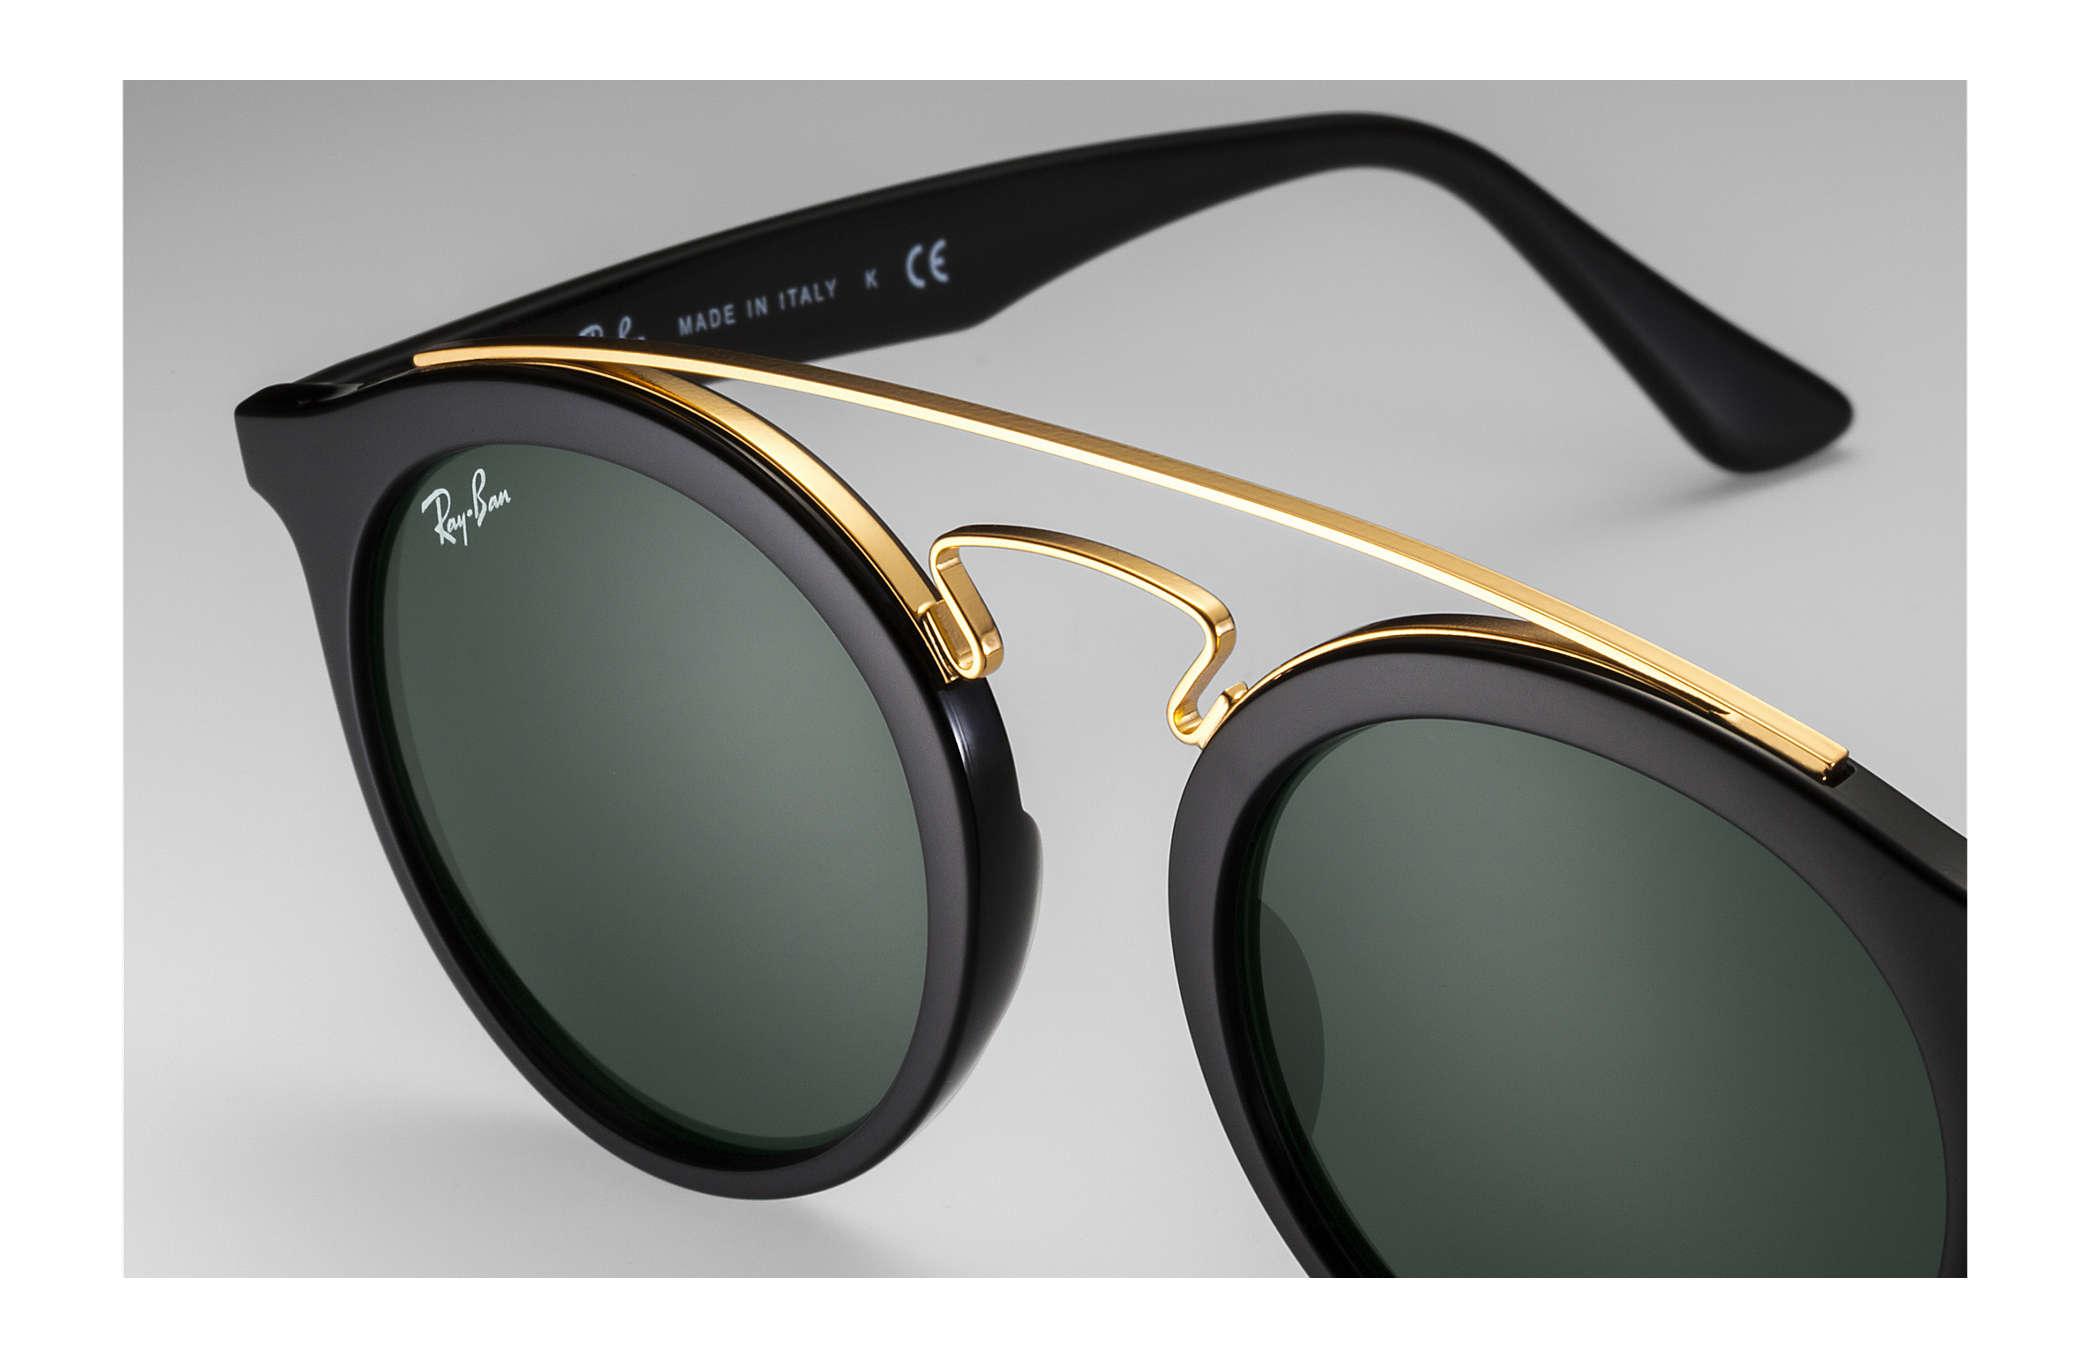 5f5332d6c5 Ray-Ban Rb4256 Gatsby I RB4256 Black - Propionate - Green Lenses ...